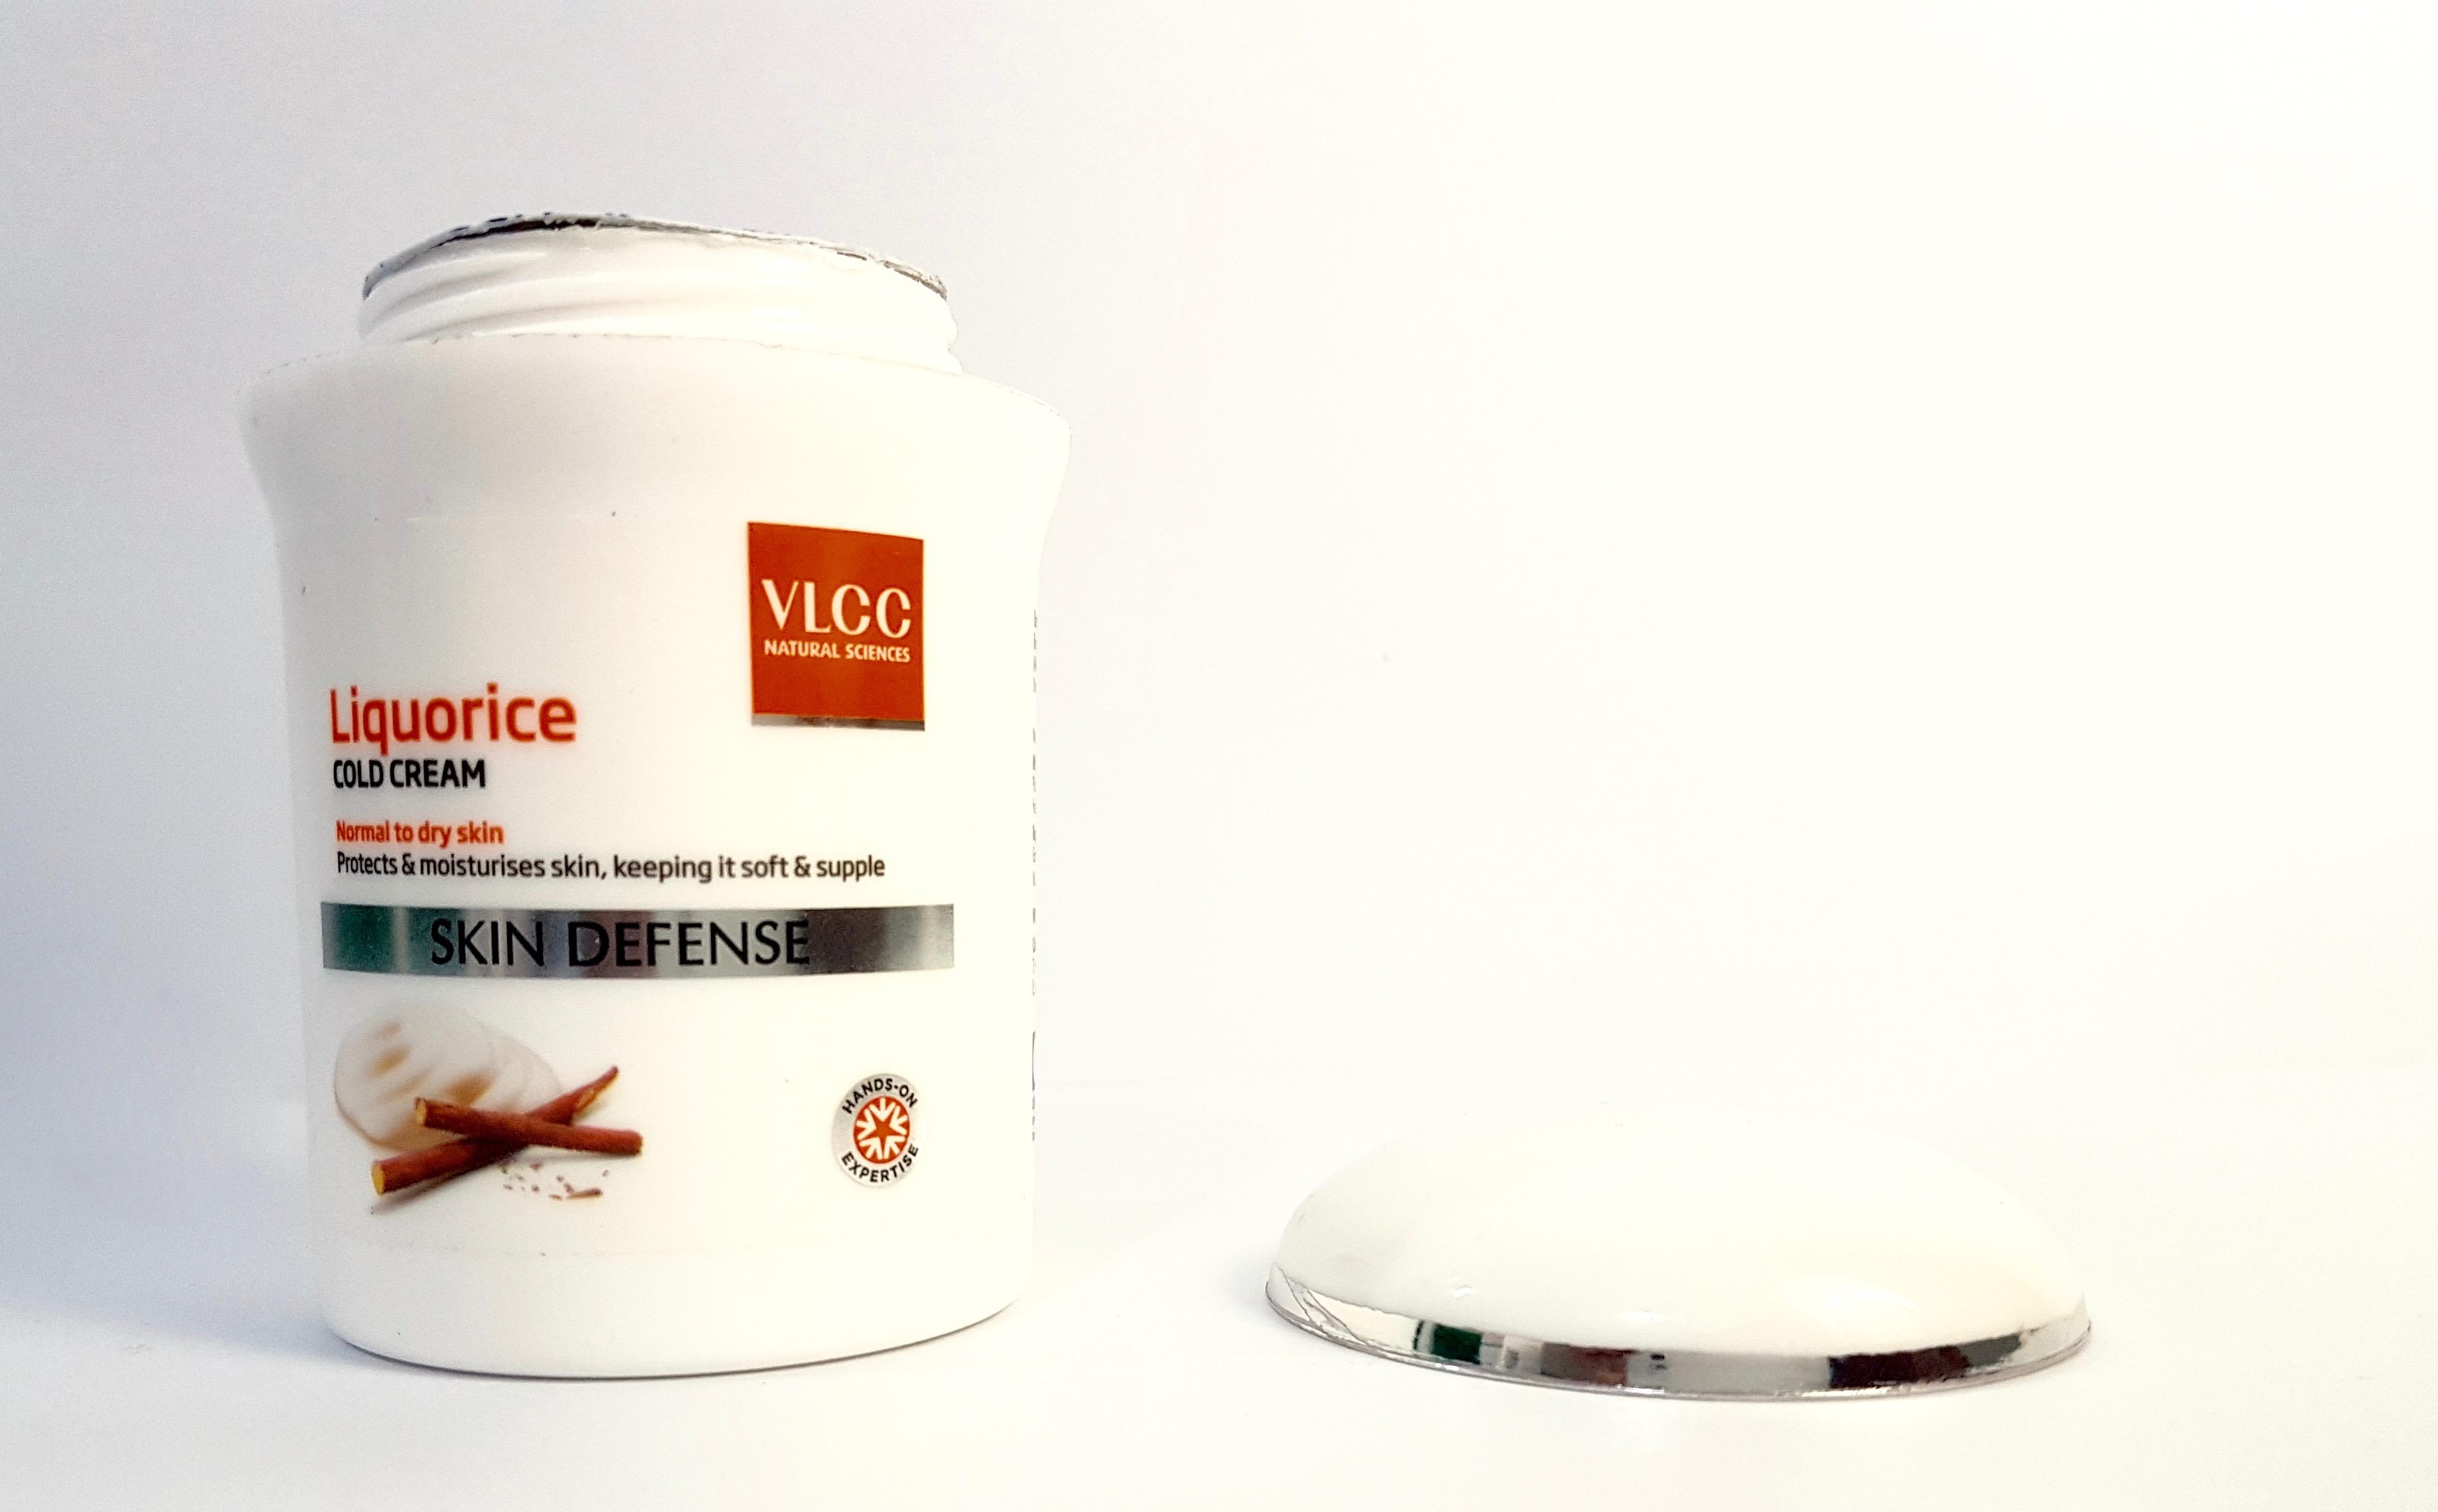 vlcc-skin-defense-liquorice-cold-cream-review-1 - Makeup ...